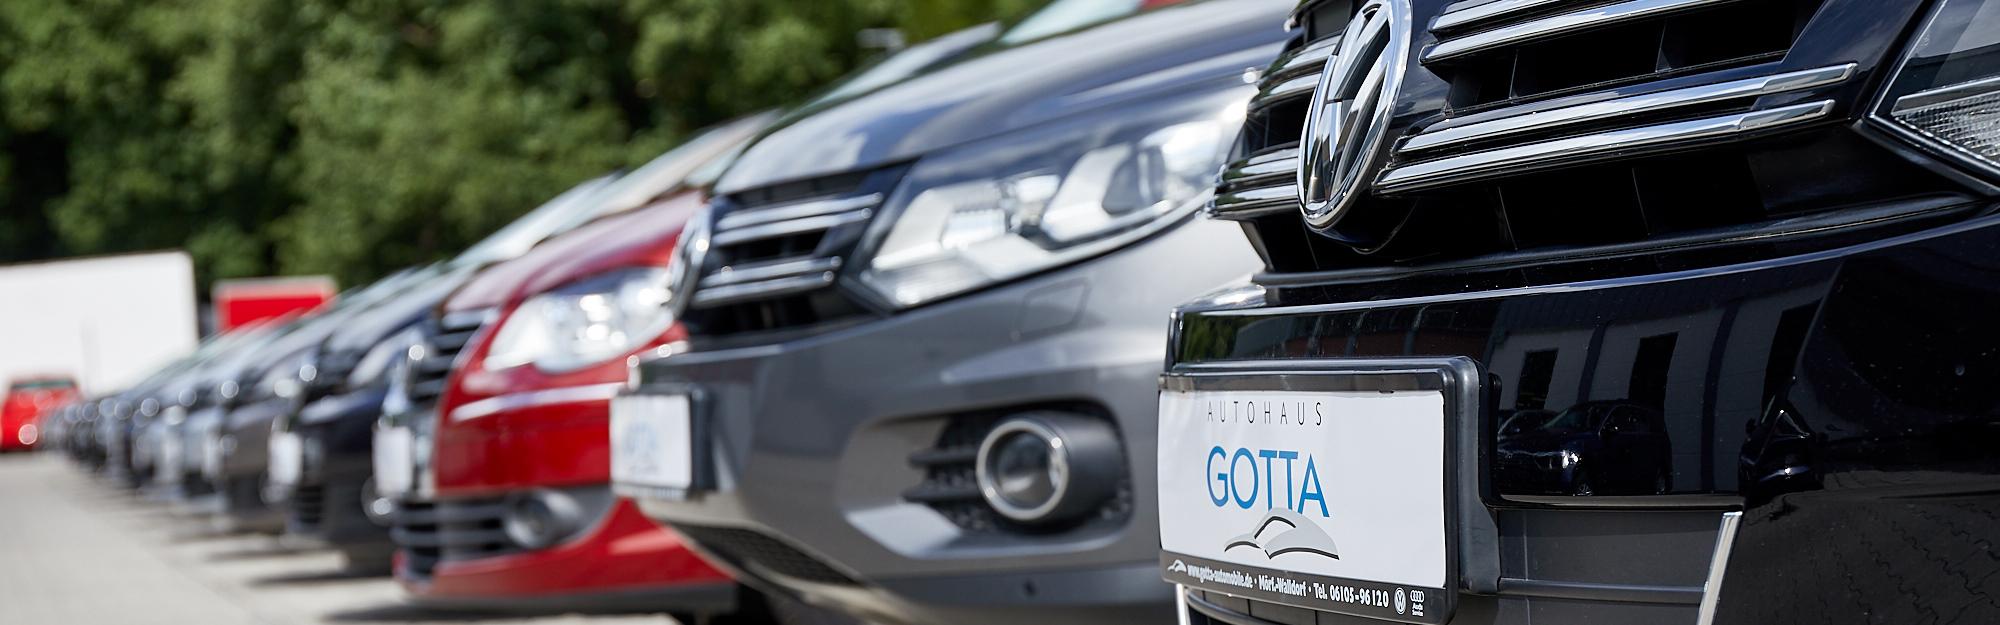 170727-Gotta-Autohaus-034